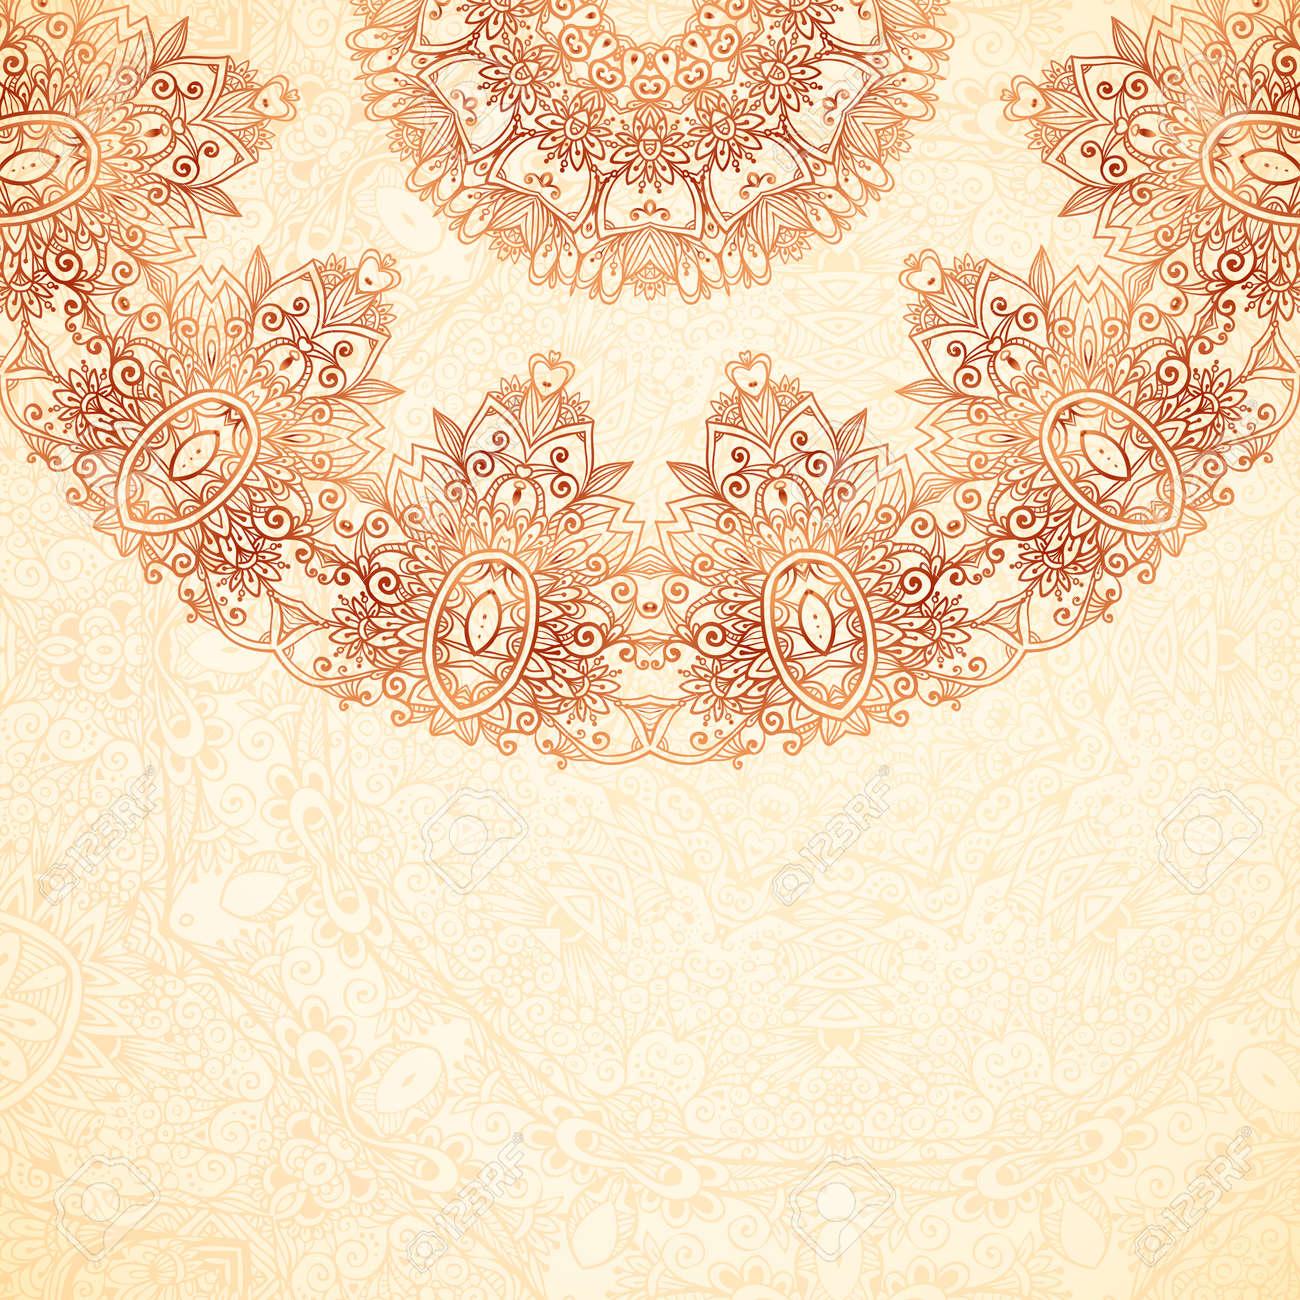 Ornate vintage vector background in mehndi style royalty free stock - Ornate Vintage Background In Mehndi Style Stock Vector 29751793